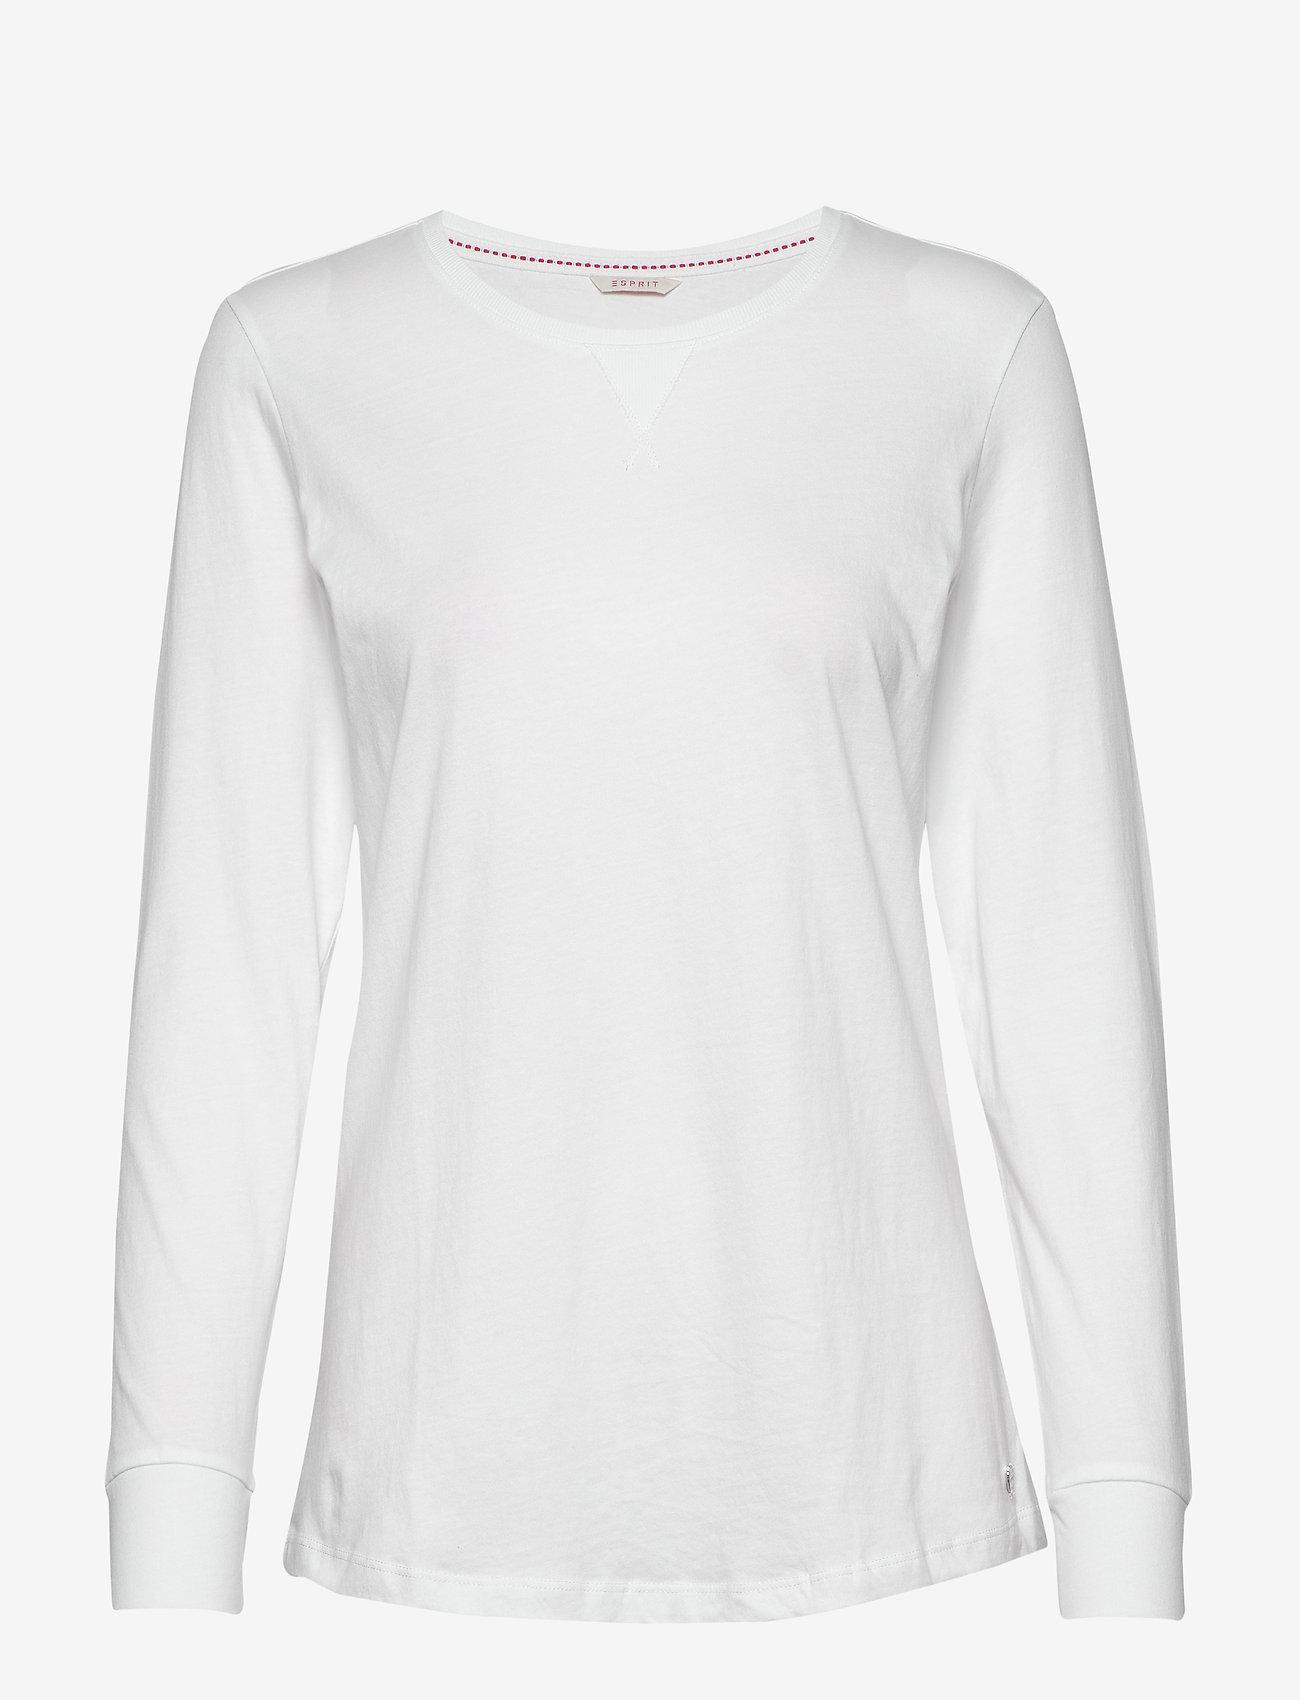 Esprit Bodywear Women - Night-T-Shirts - tops - white - 0